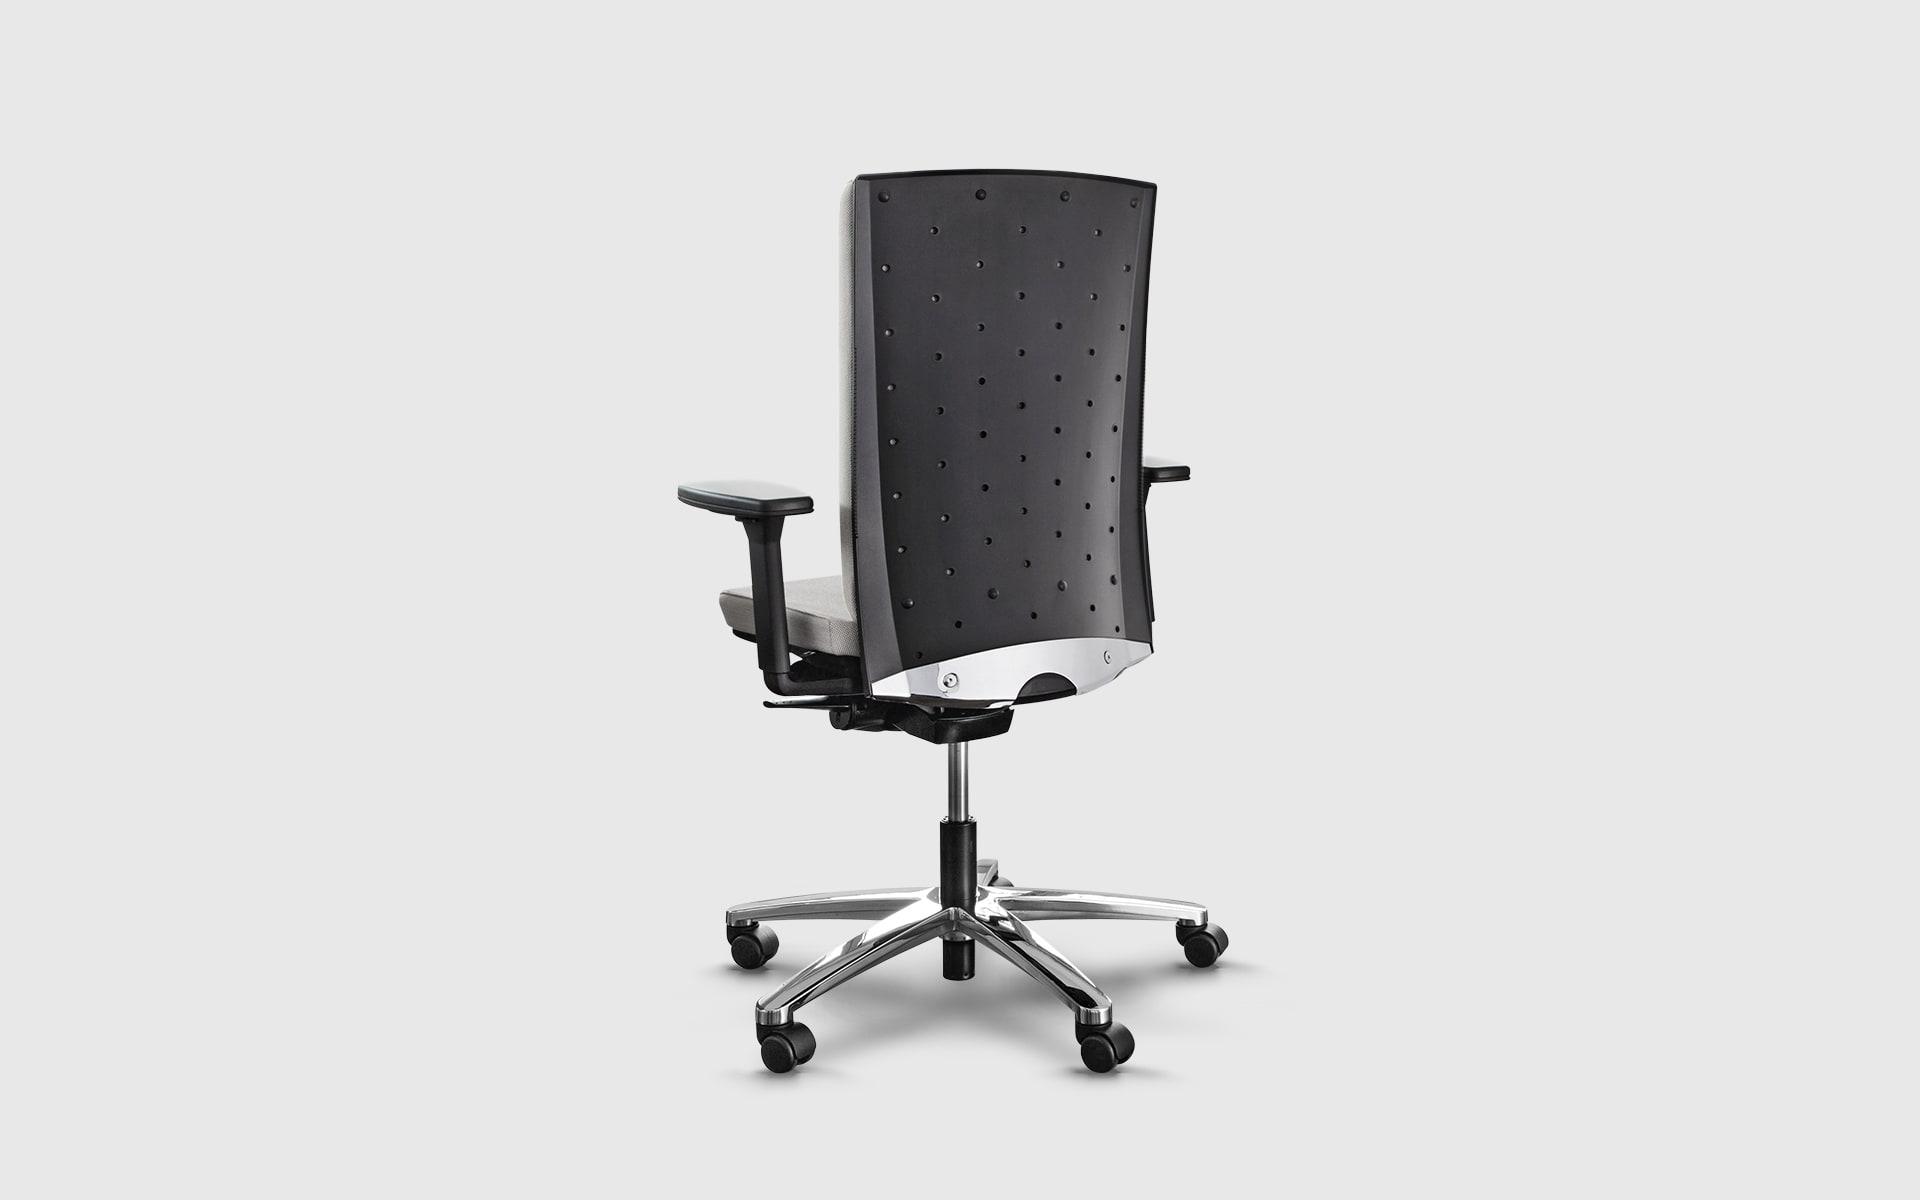 König + Neurath Tensa office chair by ITO Design with ergonomic black backrest